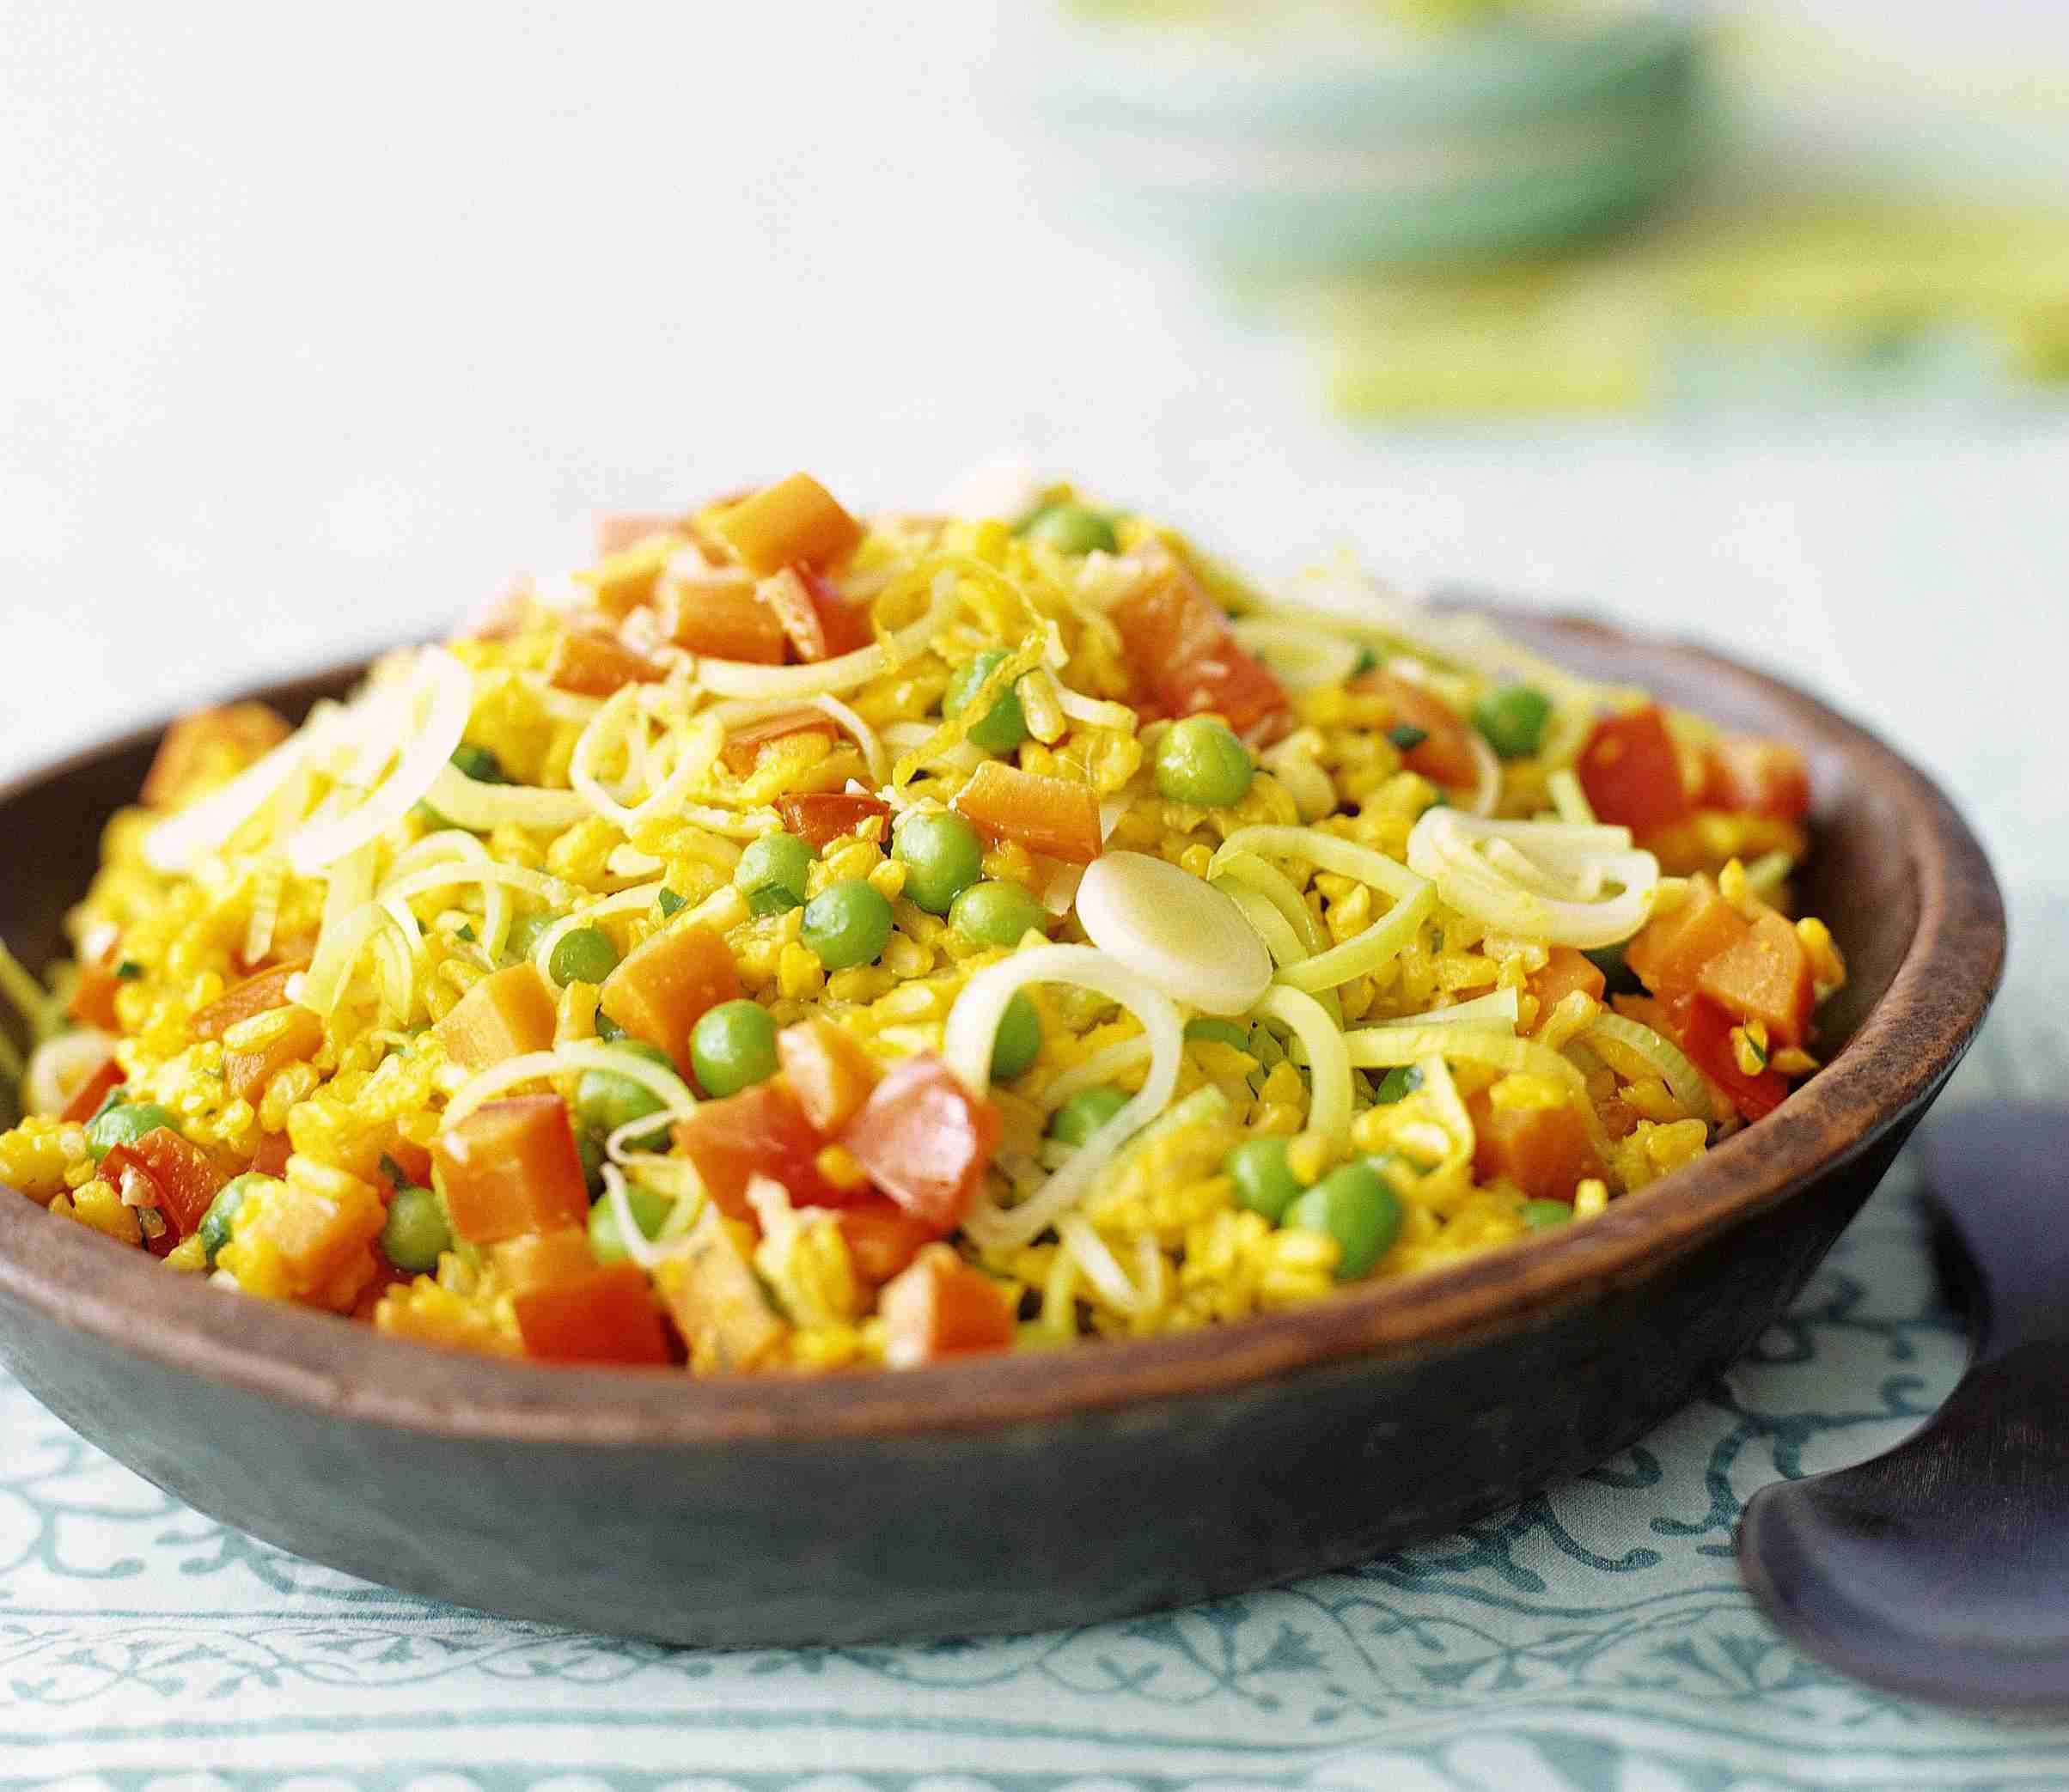 saffron rice pilaf with vegetables